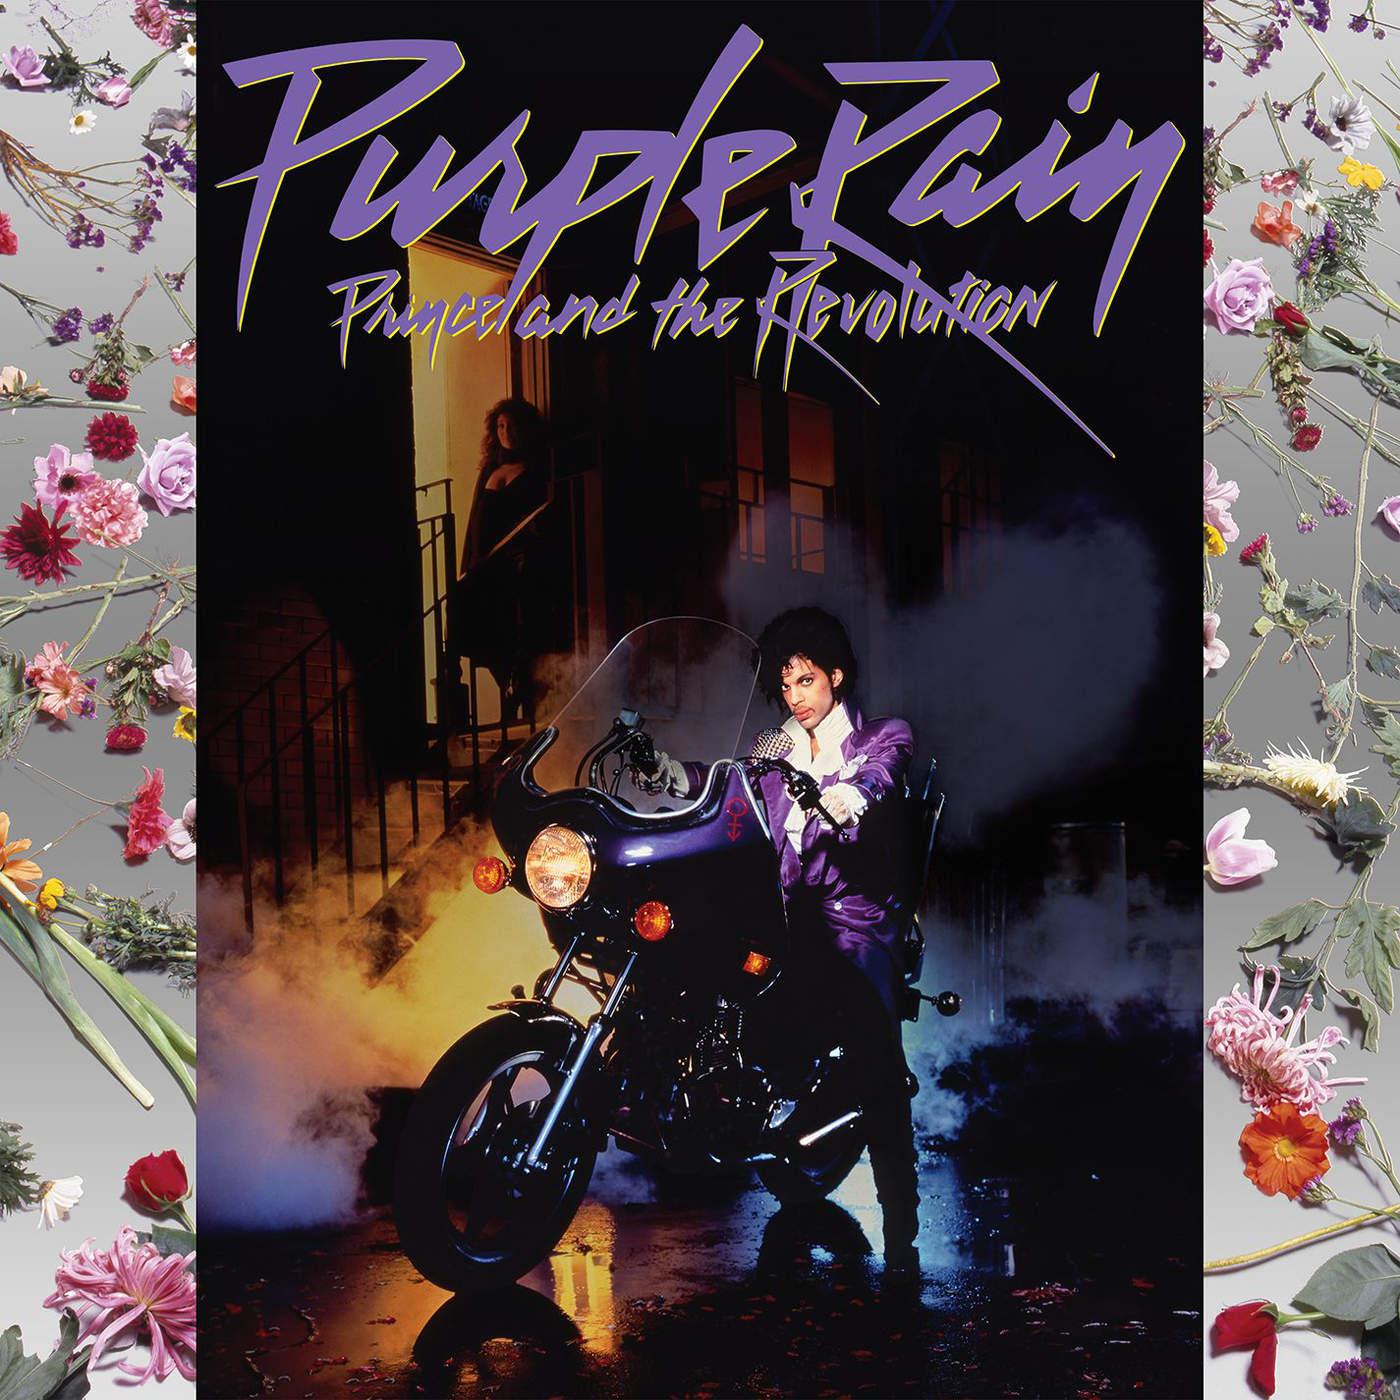 Retro iTunes Plus: Prince - Purple Rain (Deluxe) [Expanded Edition